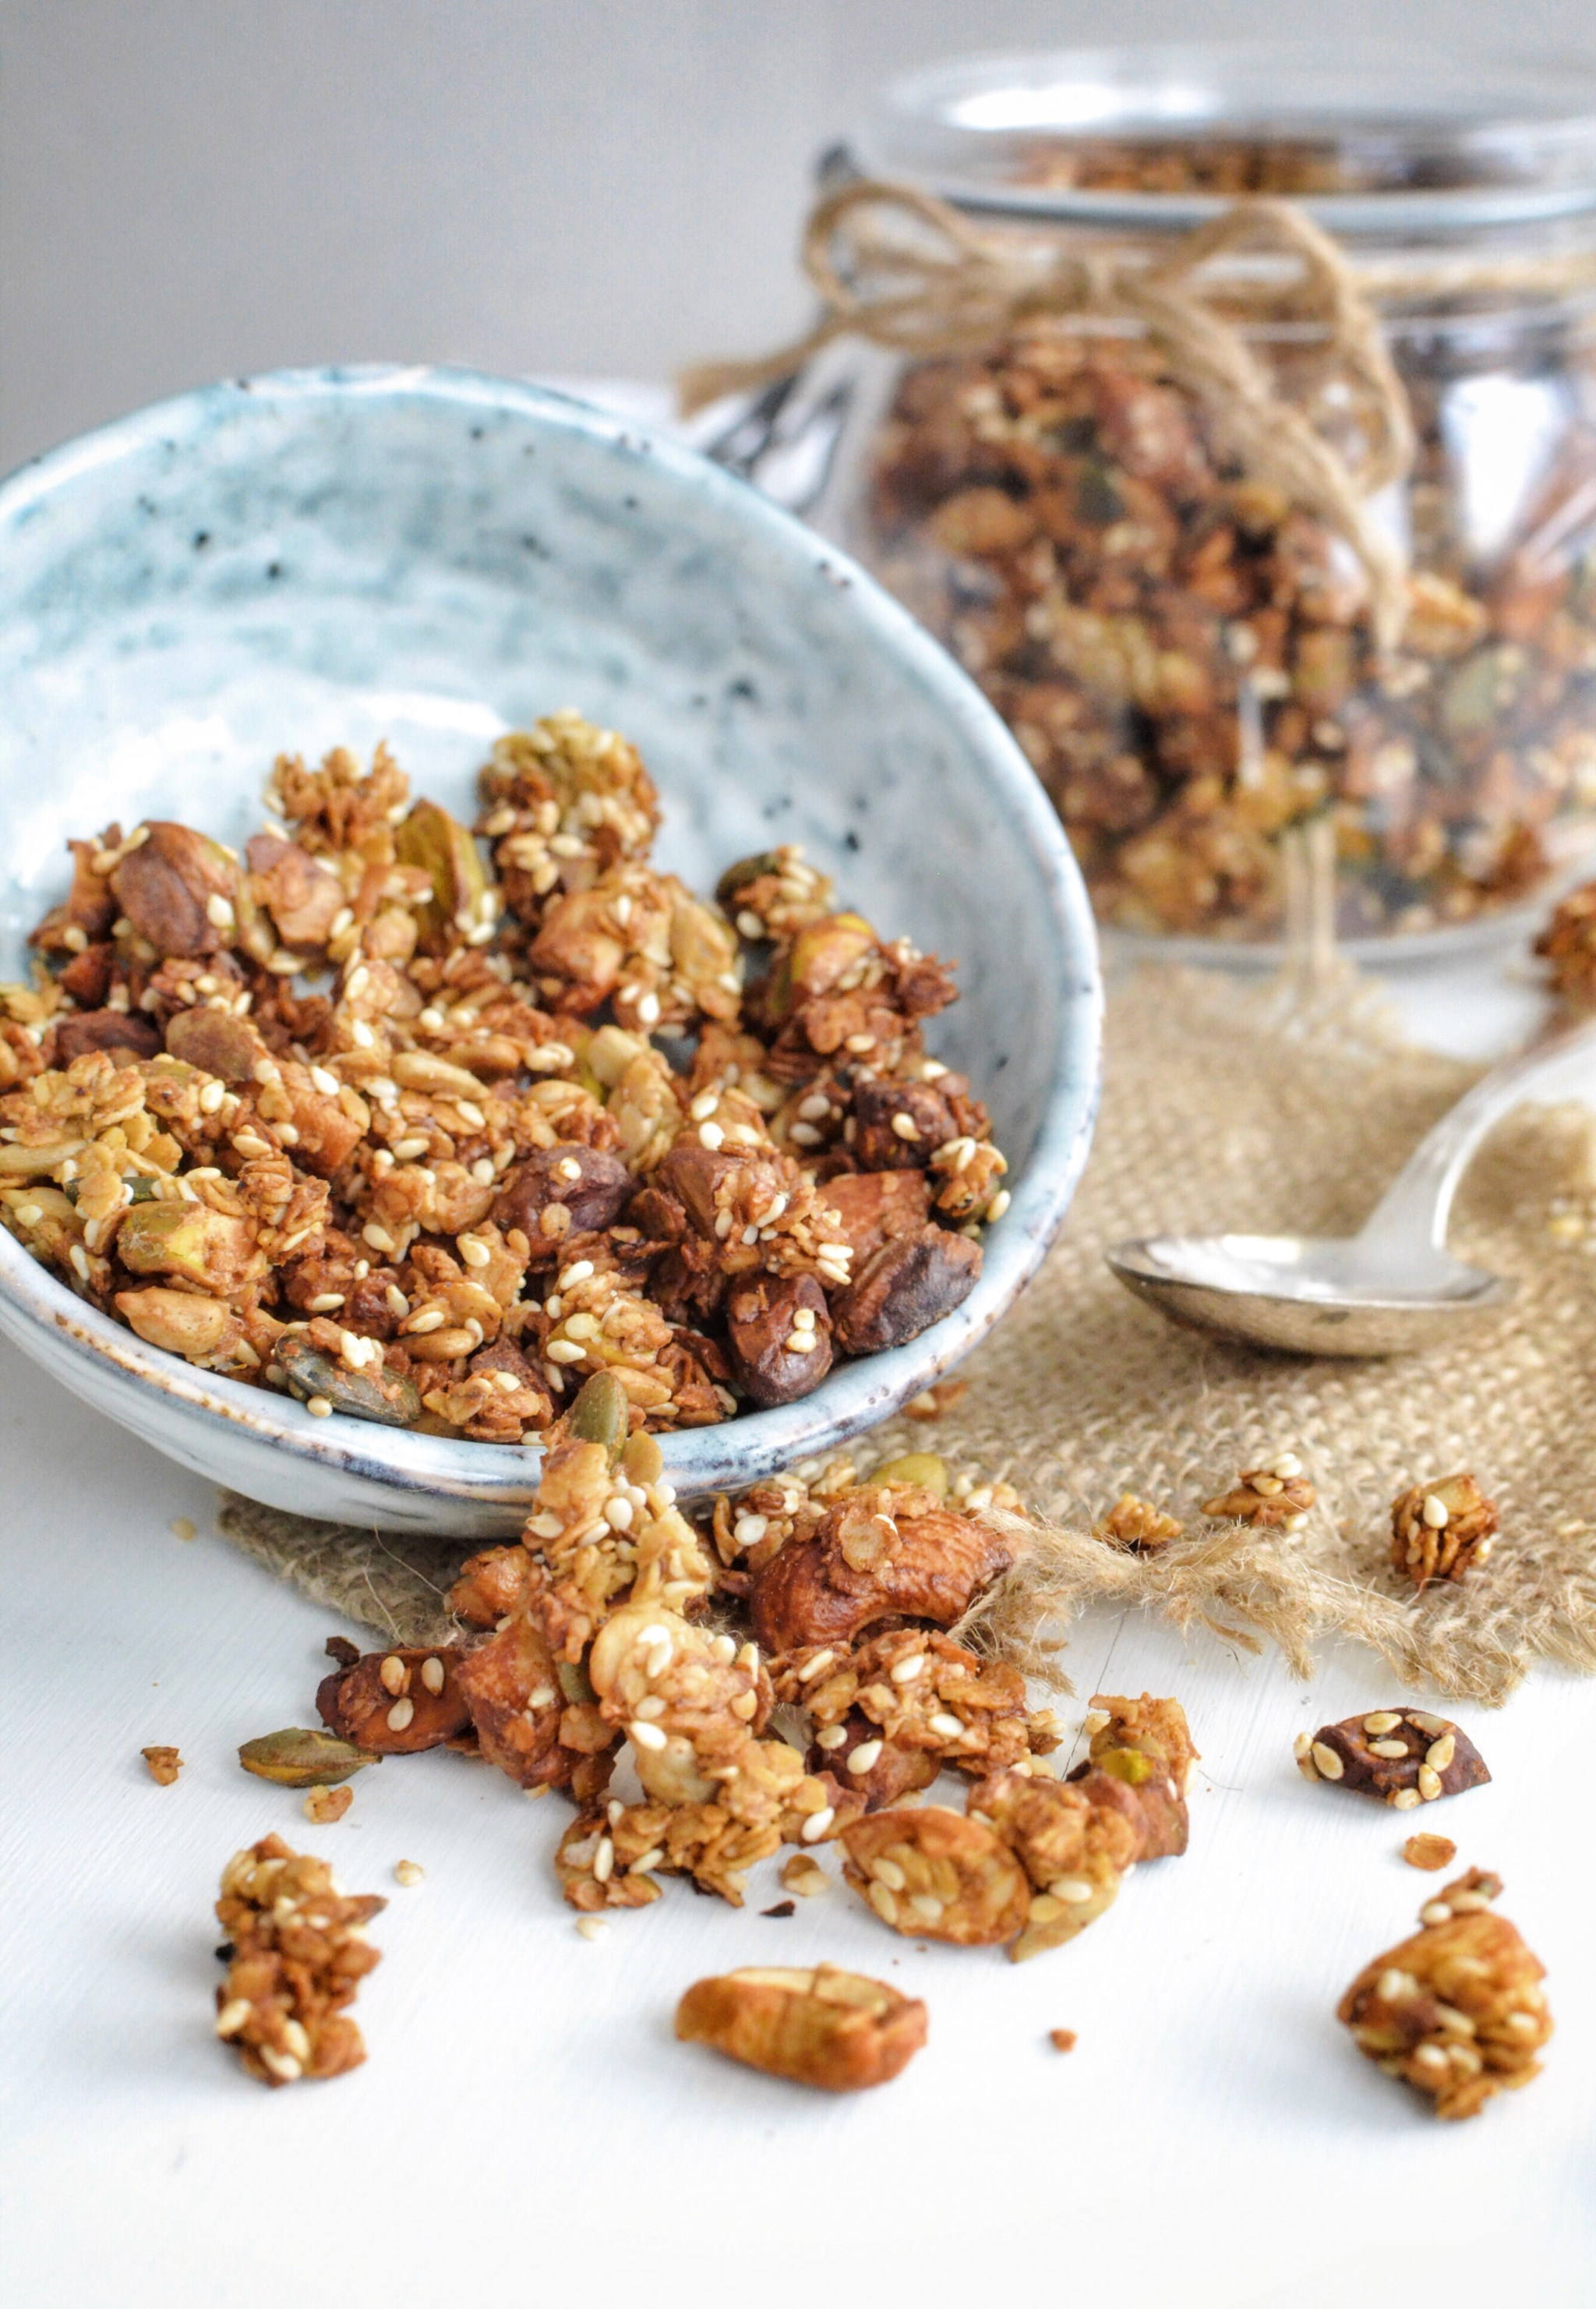 Savory Garam Masala Granola With Pistachio And Cashew Nuts Gluten Free